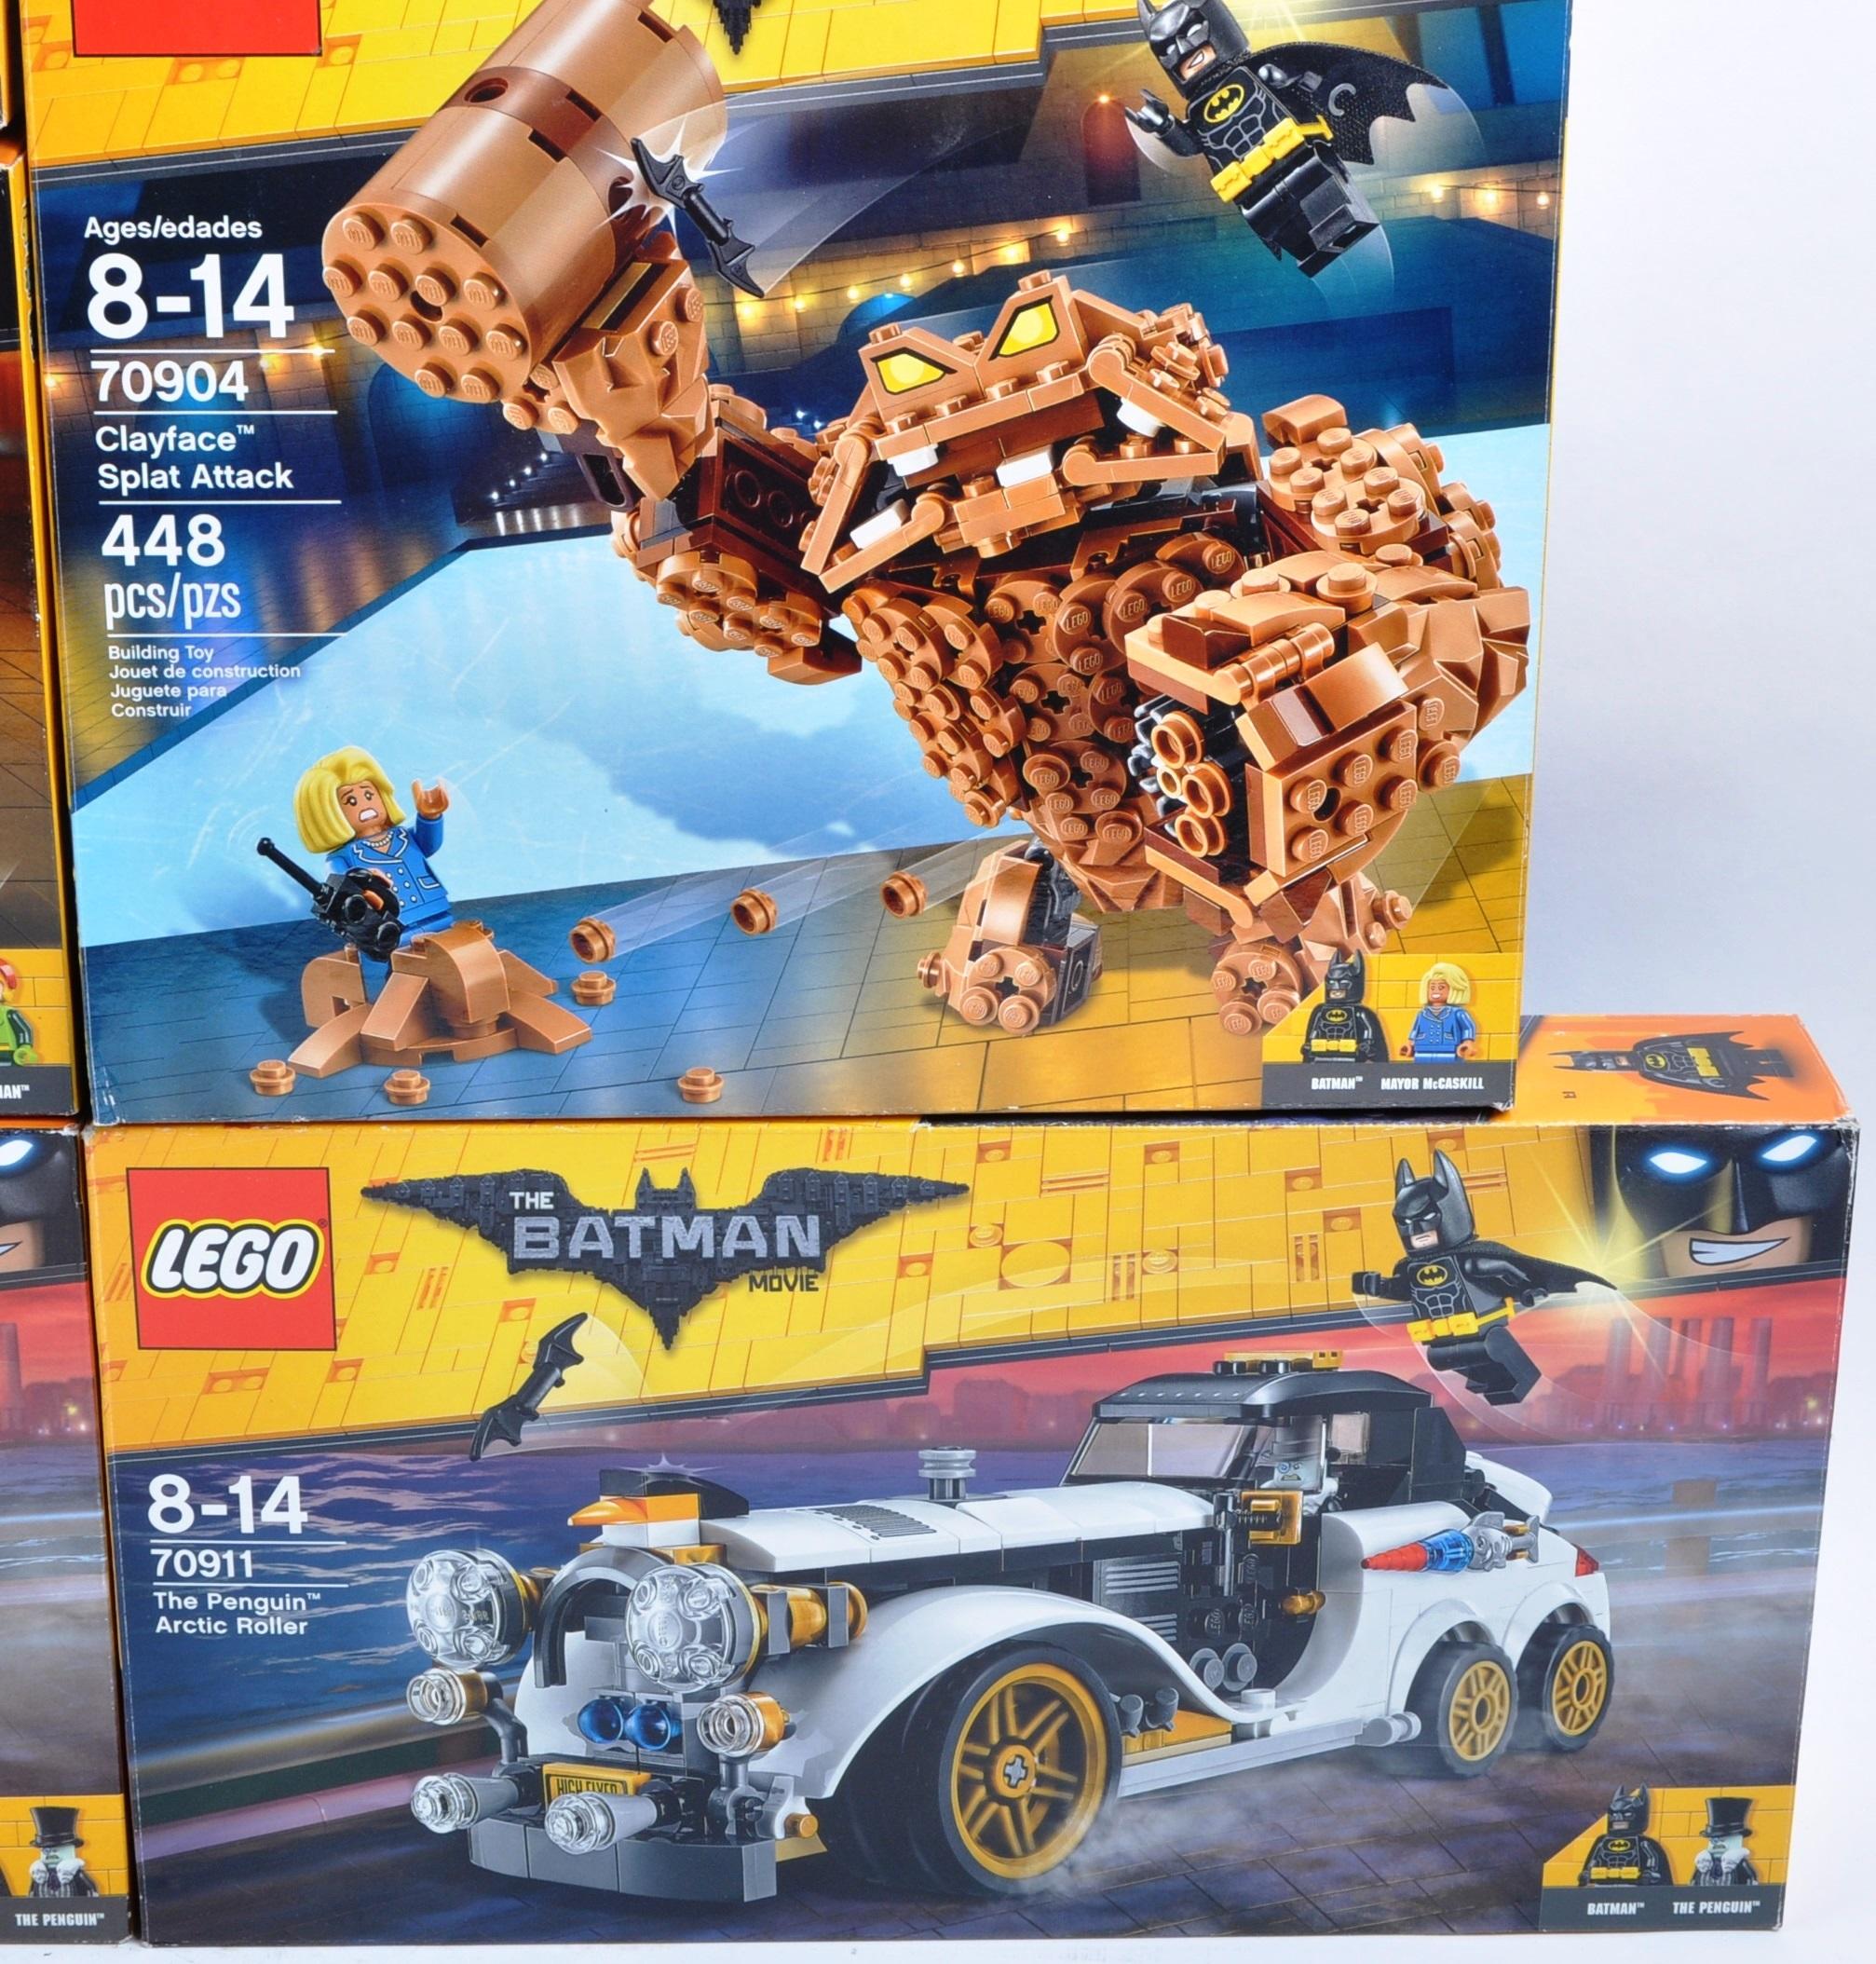 LEGO SETS - THE BATMAN MOVIE - Image 3 of 6